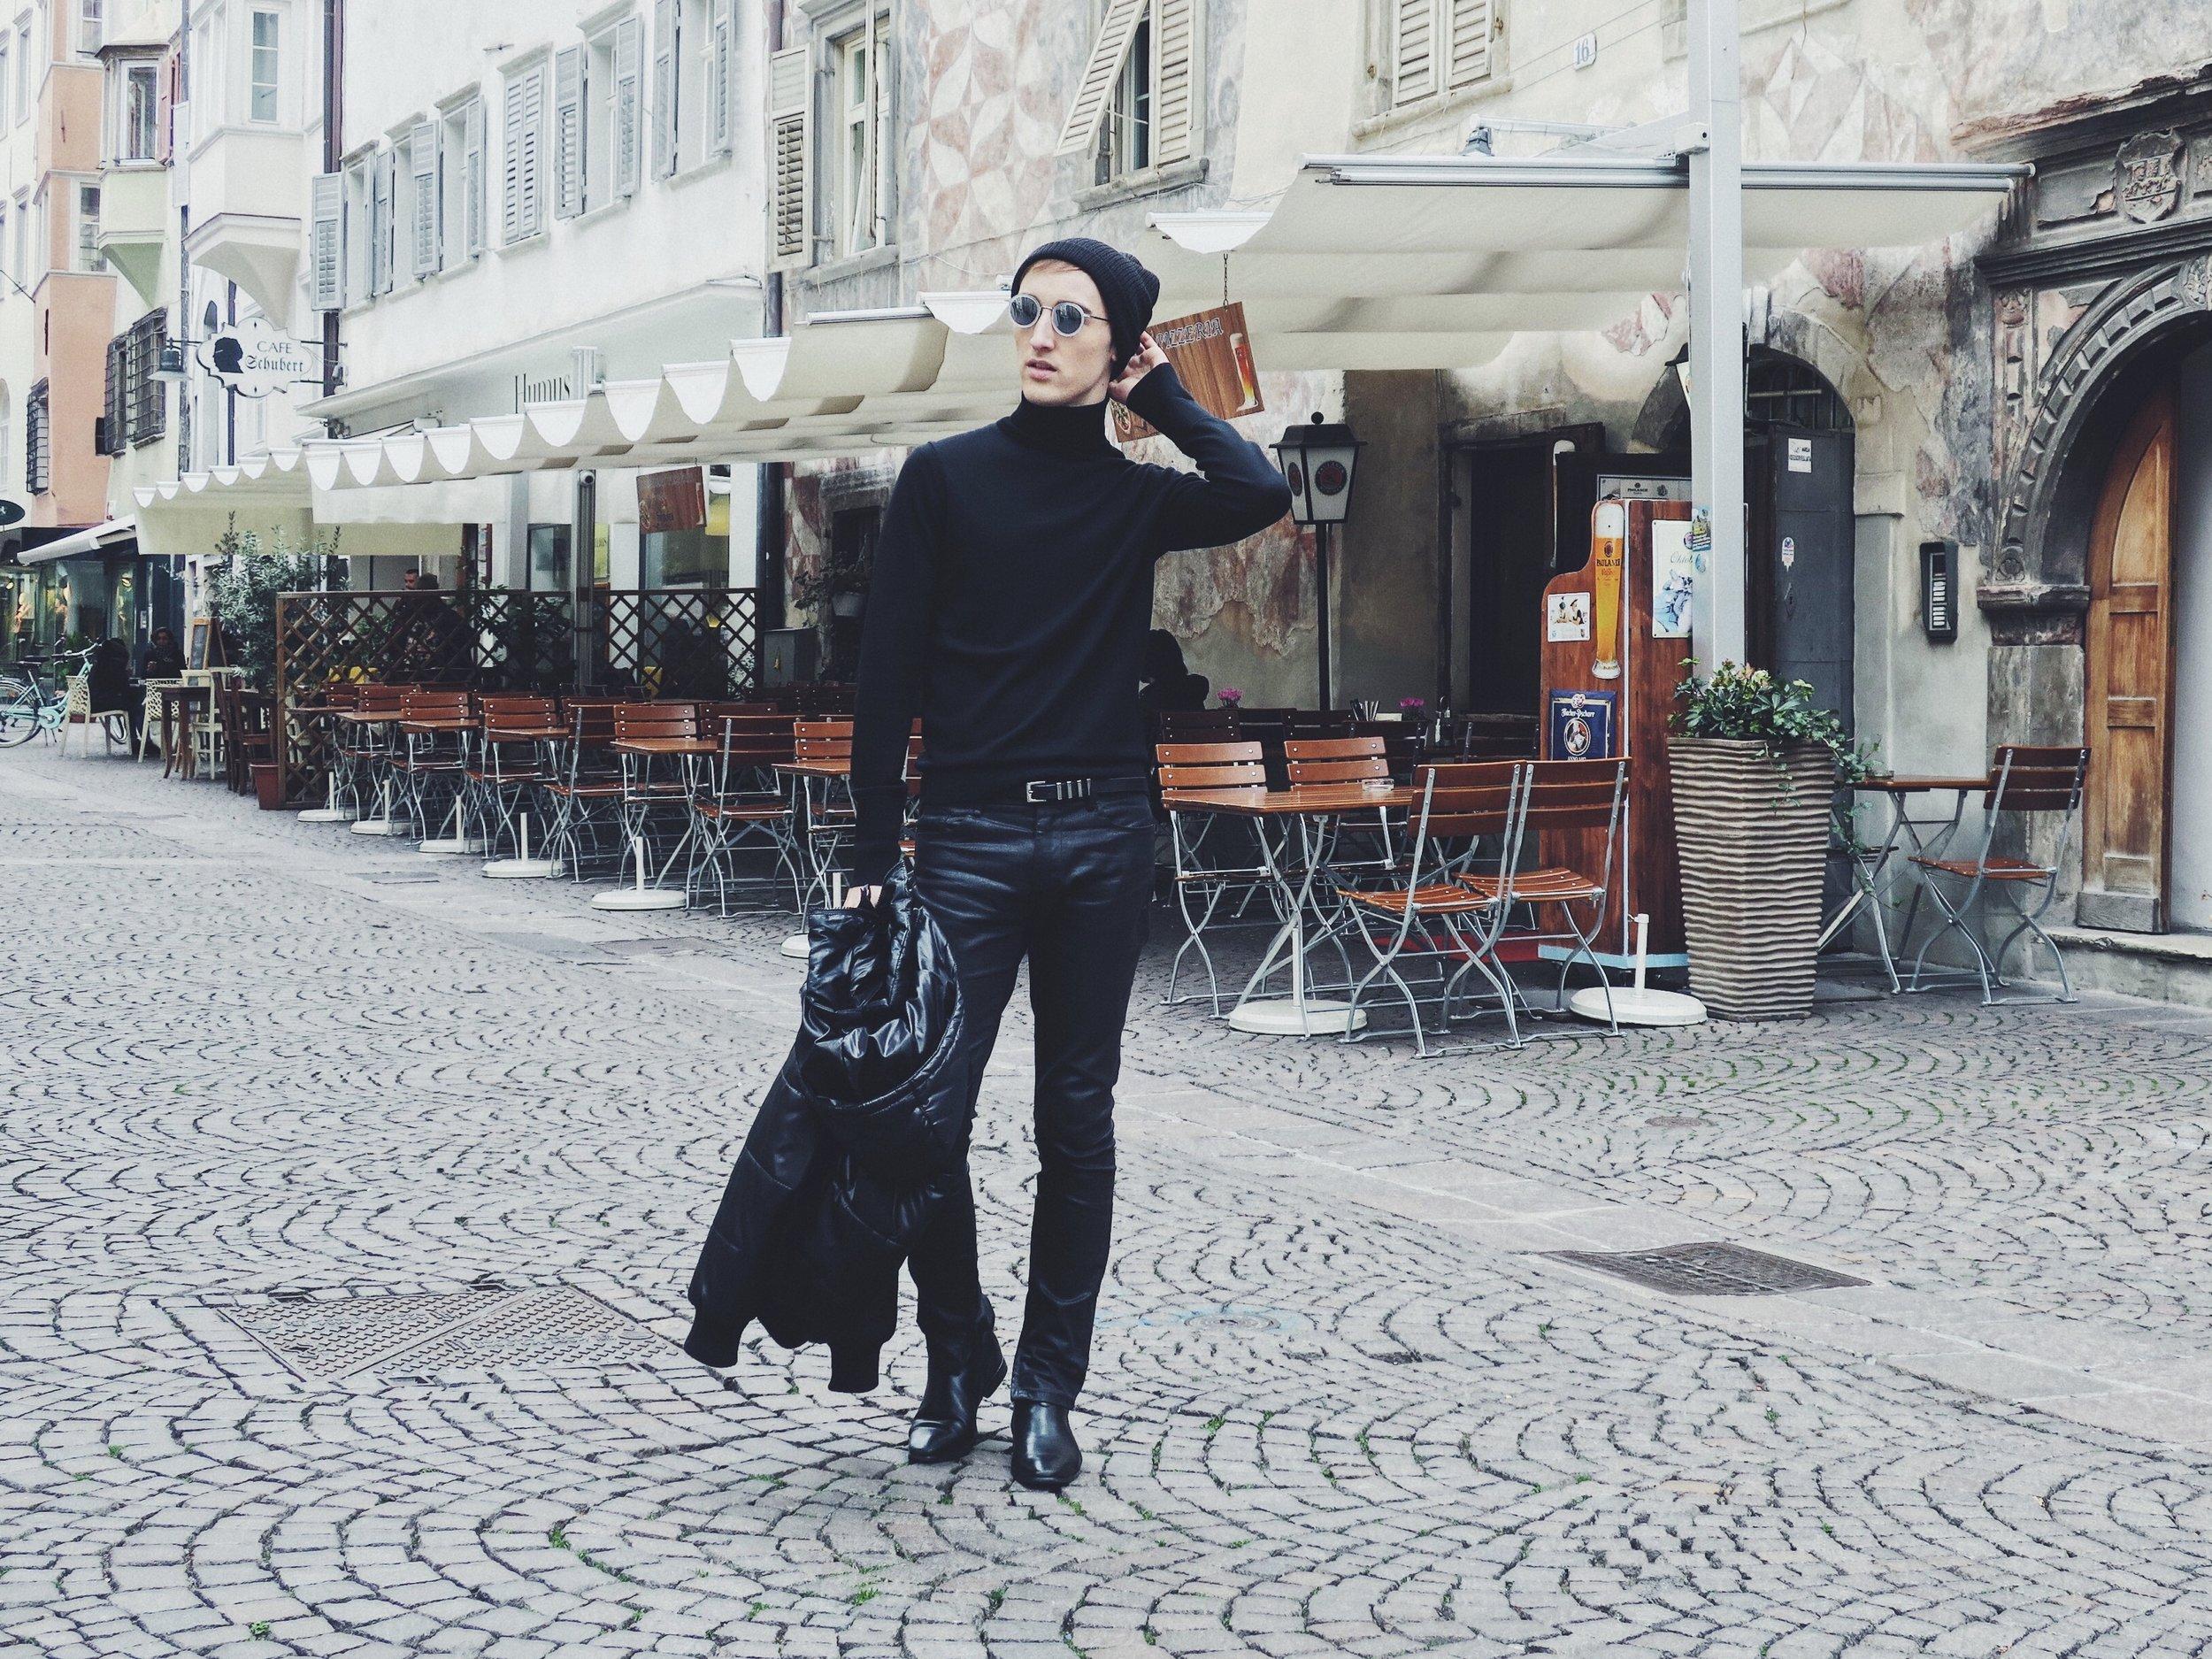 Arket turtleneck - La Redoute jacket - Zara jeans - New Look beanie - Komono sunglasses - Zara belt - Sacha ankle boots